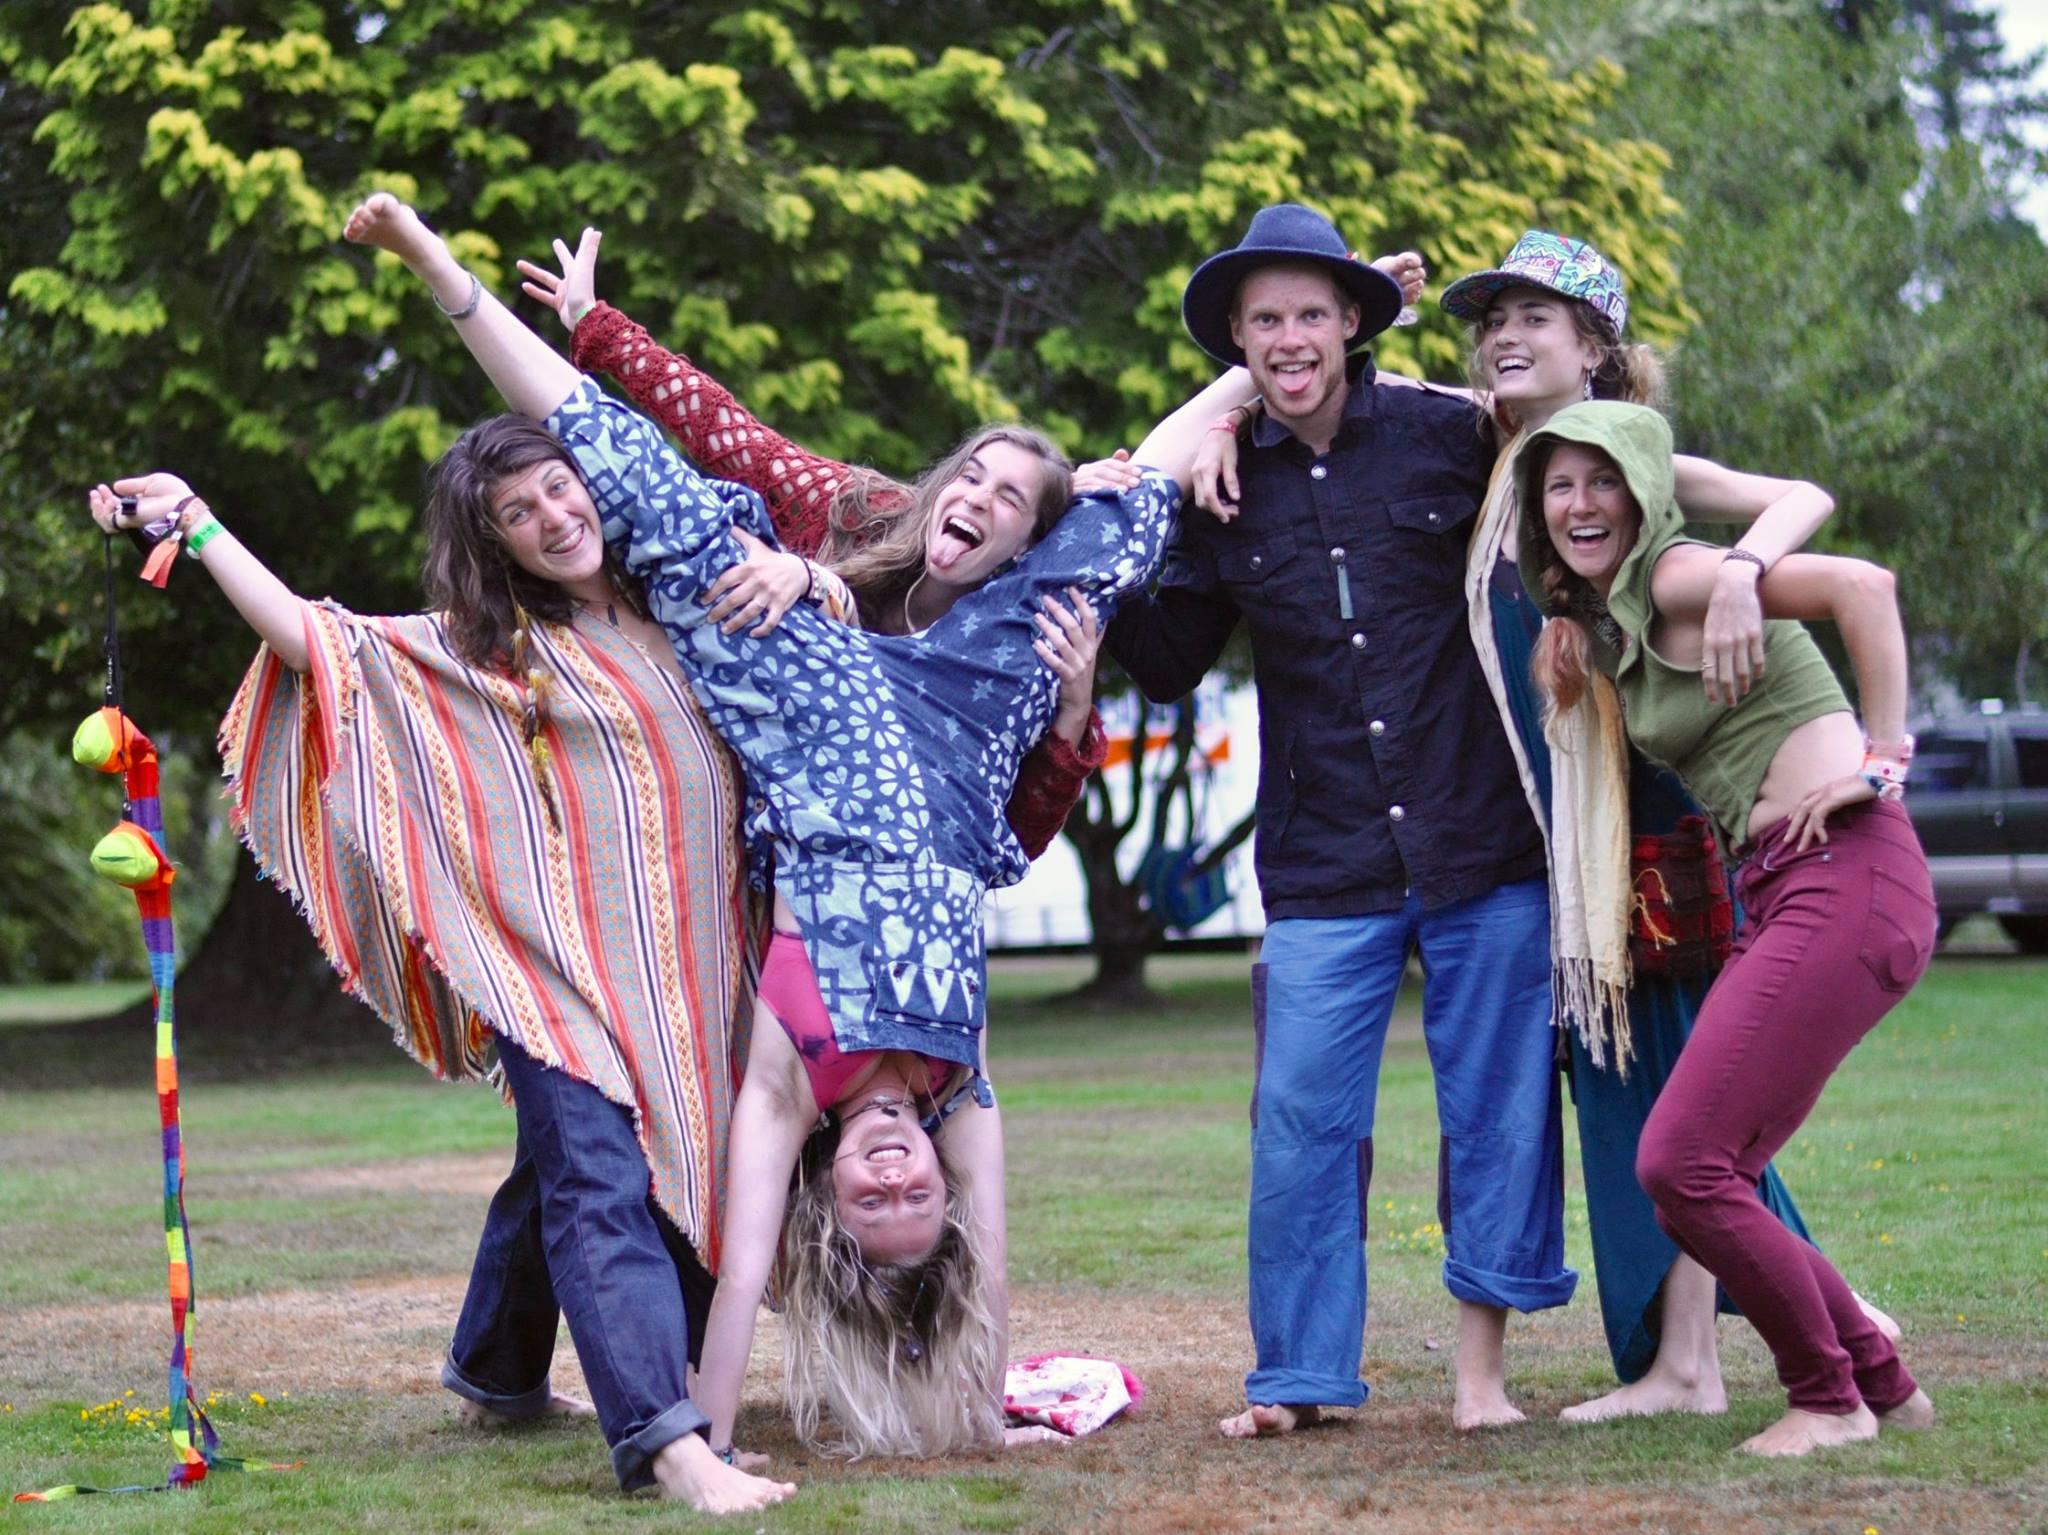 NEW ZEALAND – Wanderlust 2016 festival